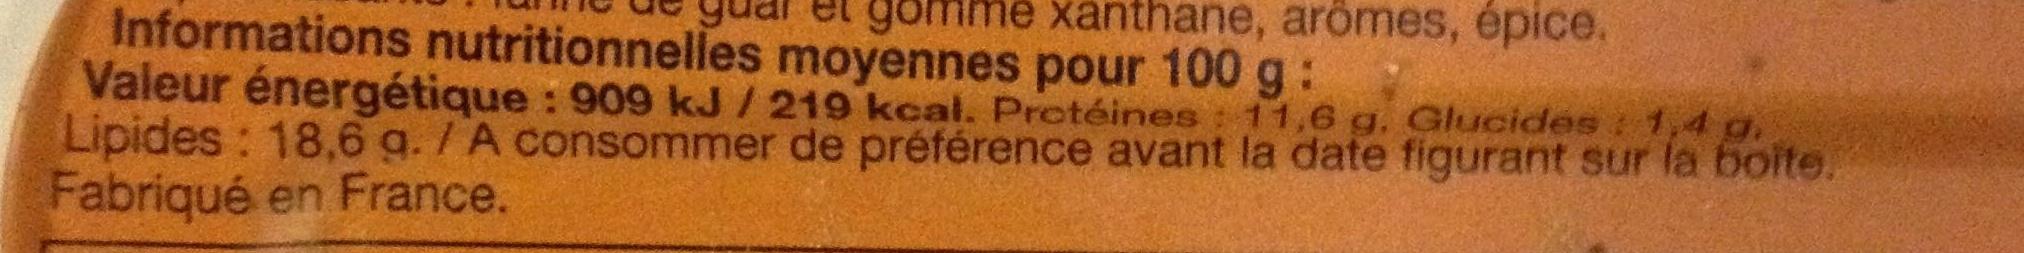 Filets de Maquereaux (Sauce Moutarde de Dijon) - Voedingswaarden - fr